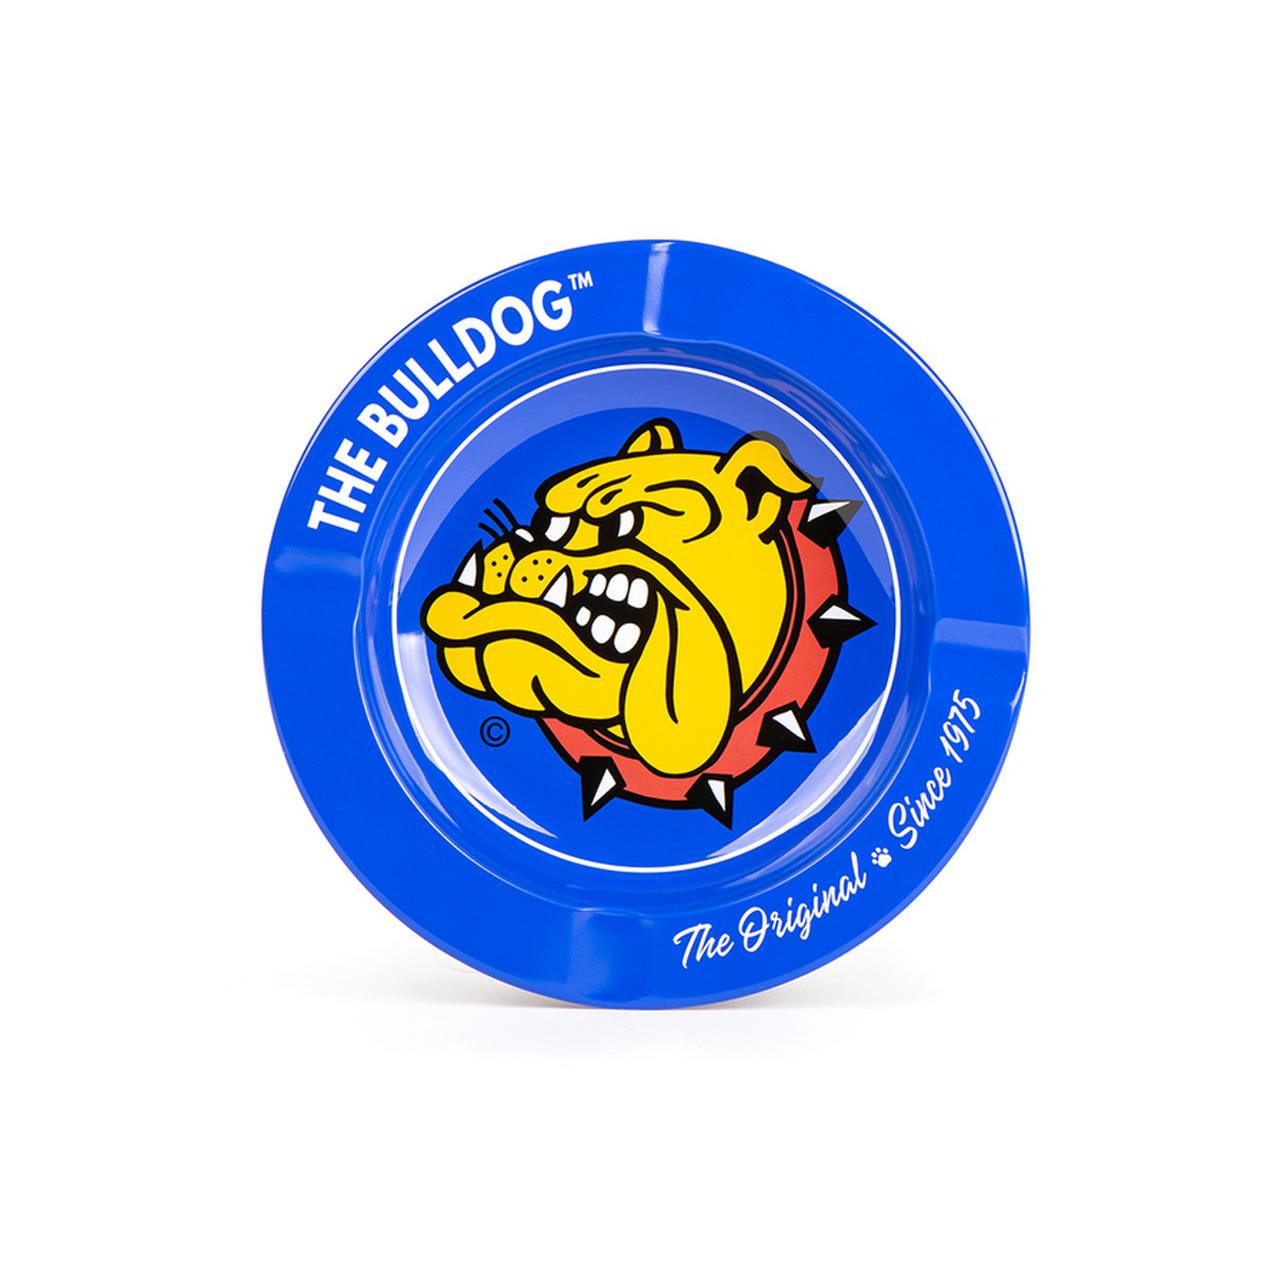 Cinzeiro Alumínio The Bulldog Amsterdam AZUL